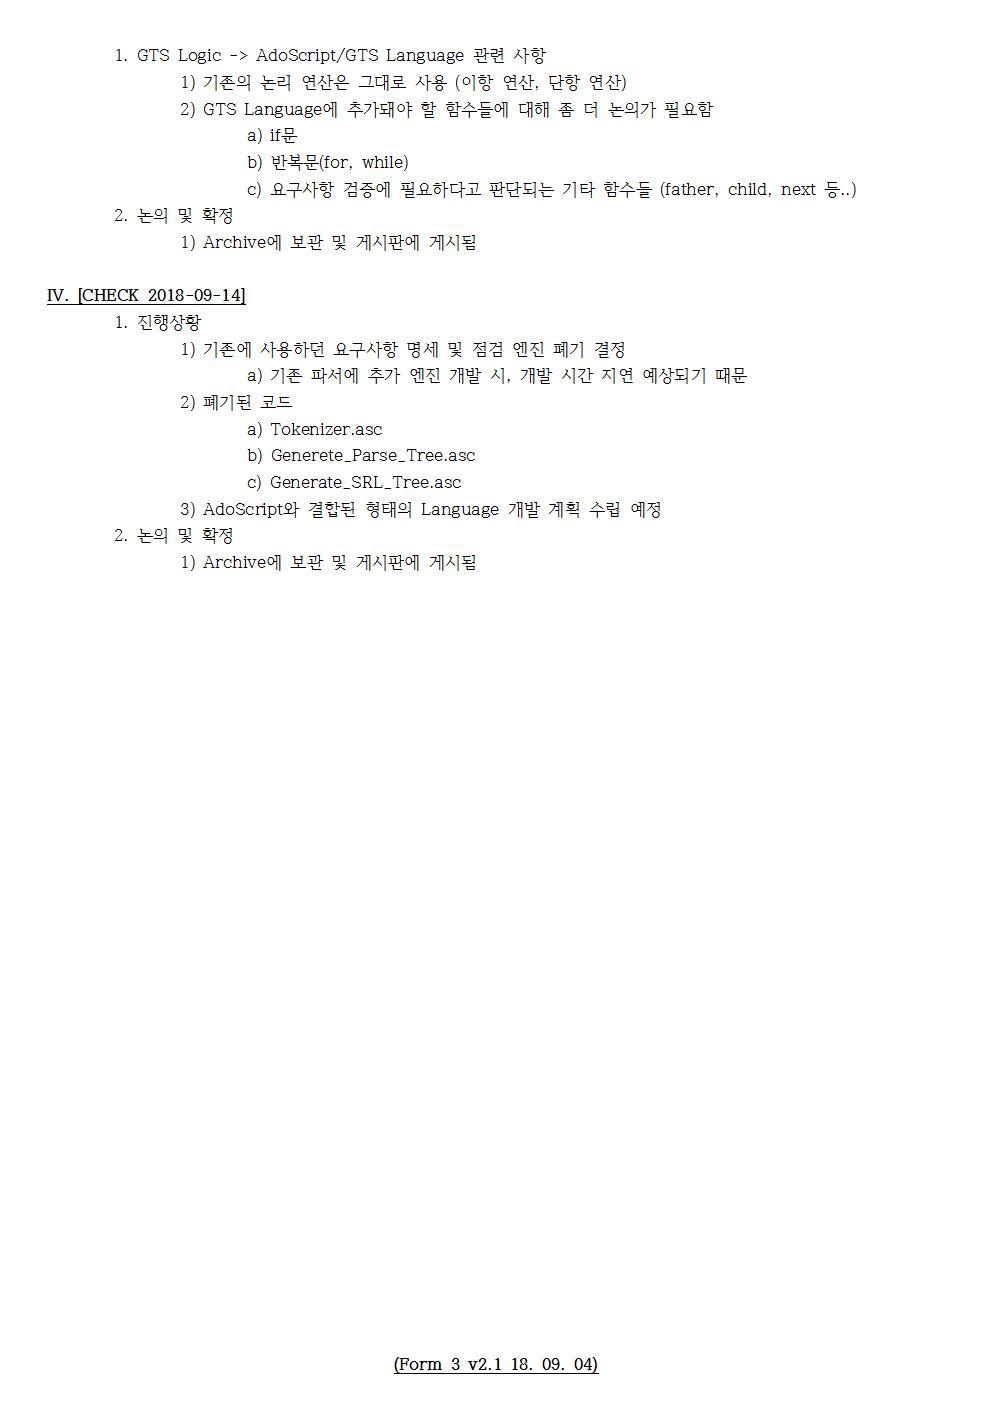 D-[18-001-RD-01]-[SAVE 3.0]-[2018-09-14][SH]002.jpg